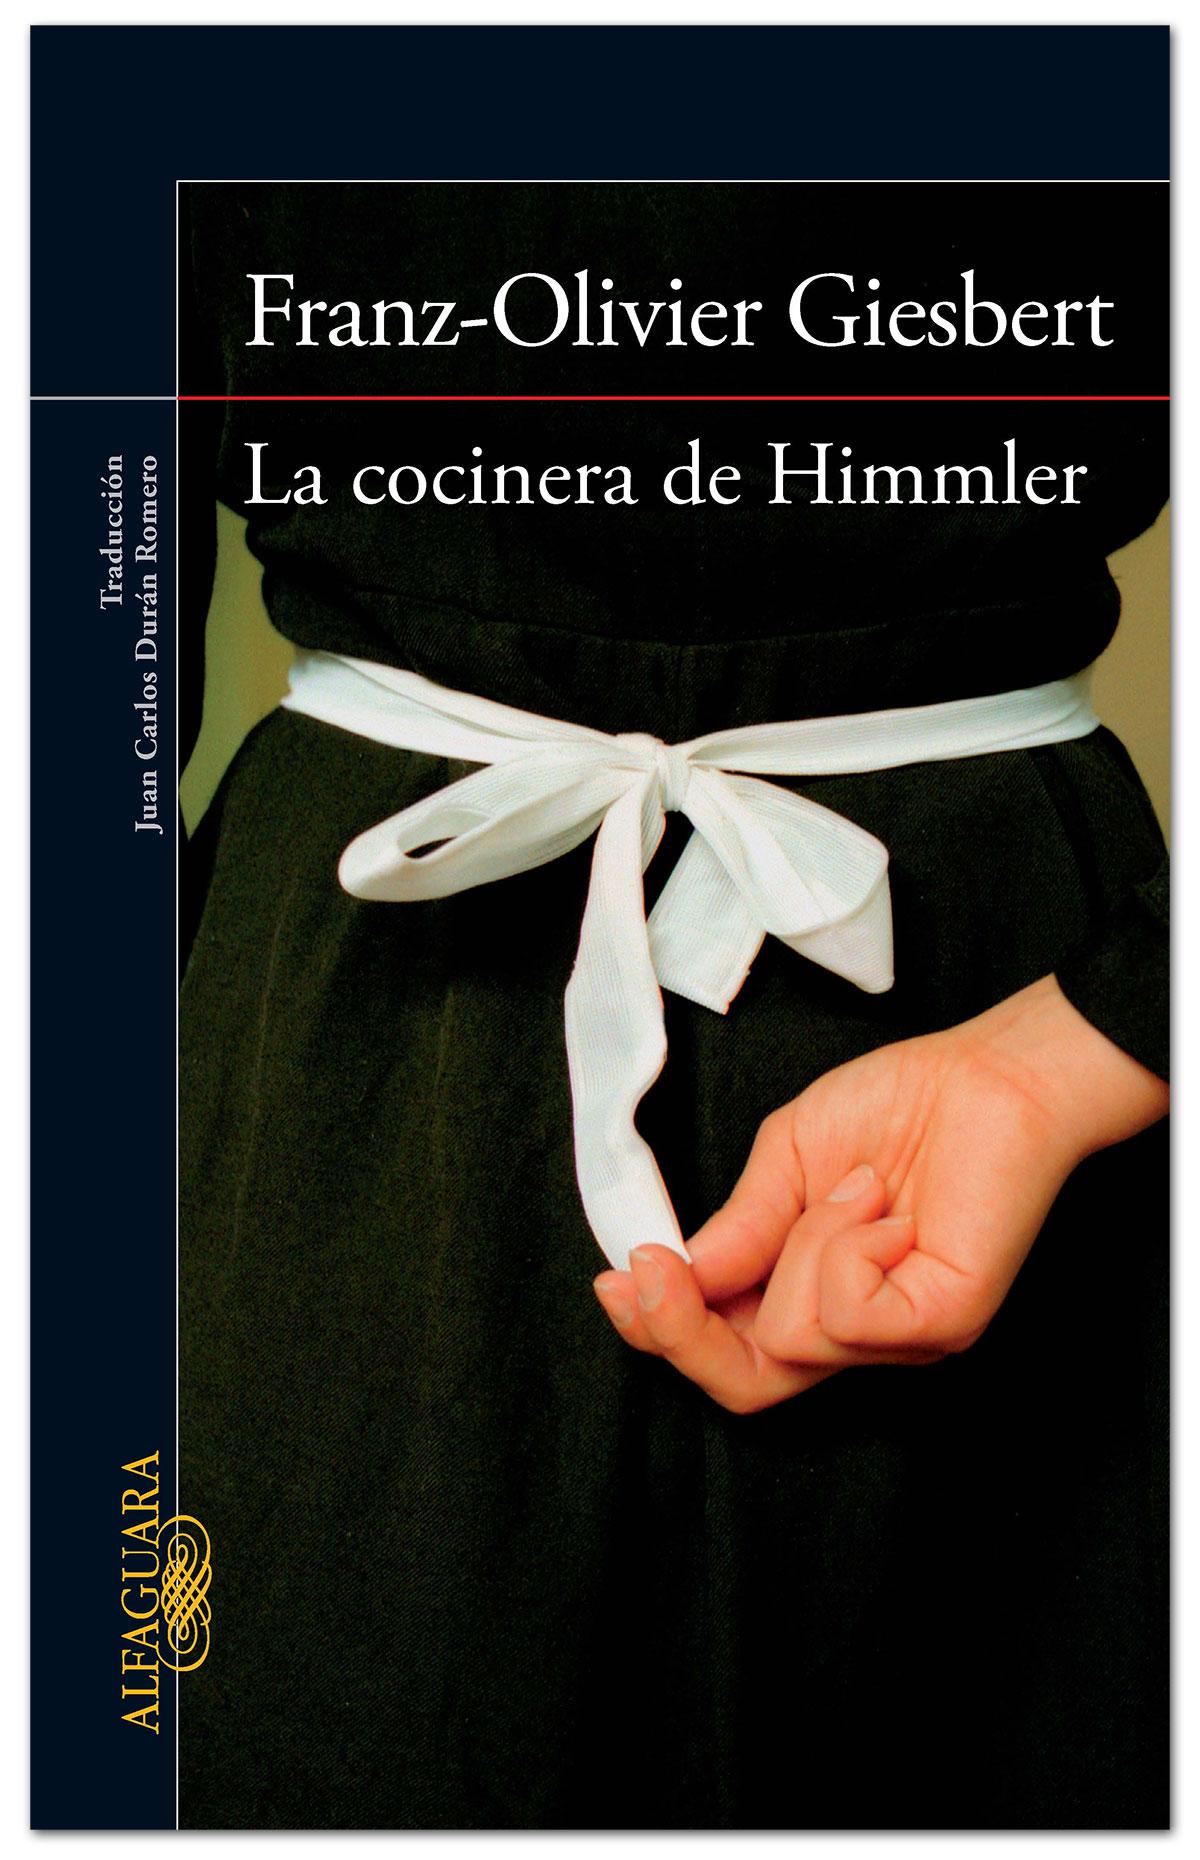 La cocinera de Himmler - Franz-Olivier Giesbert